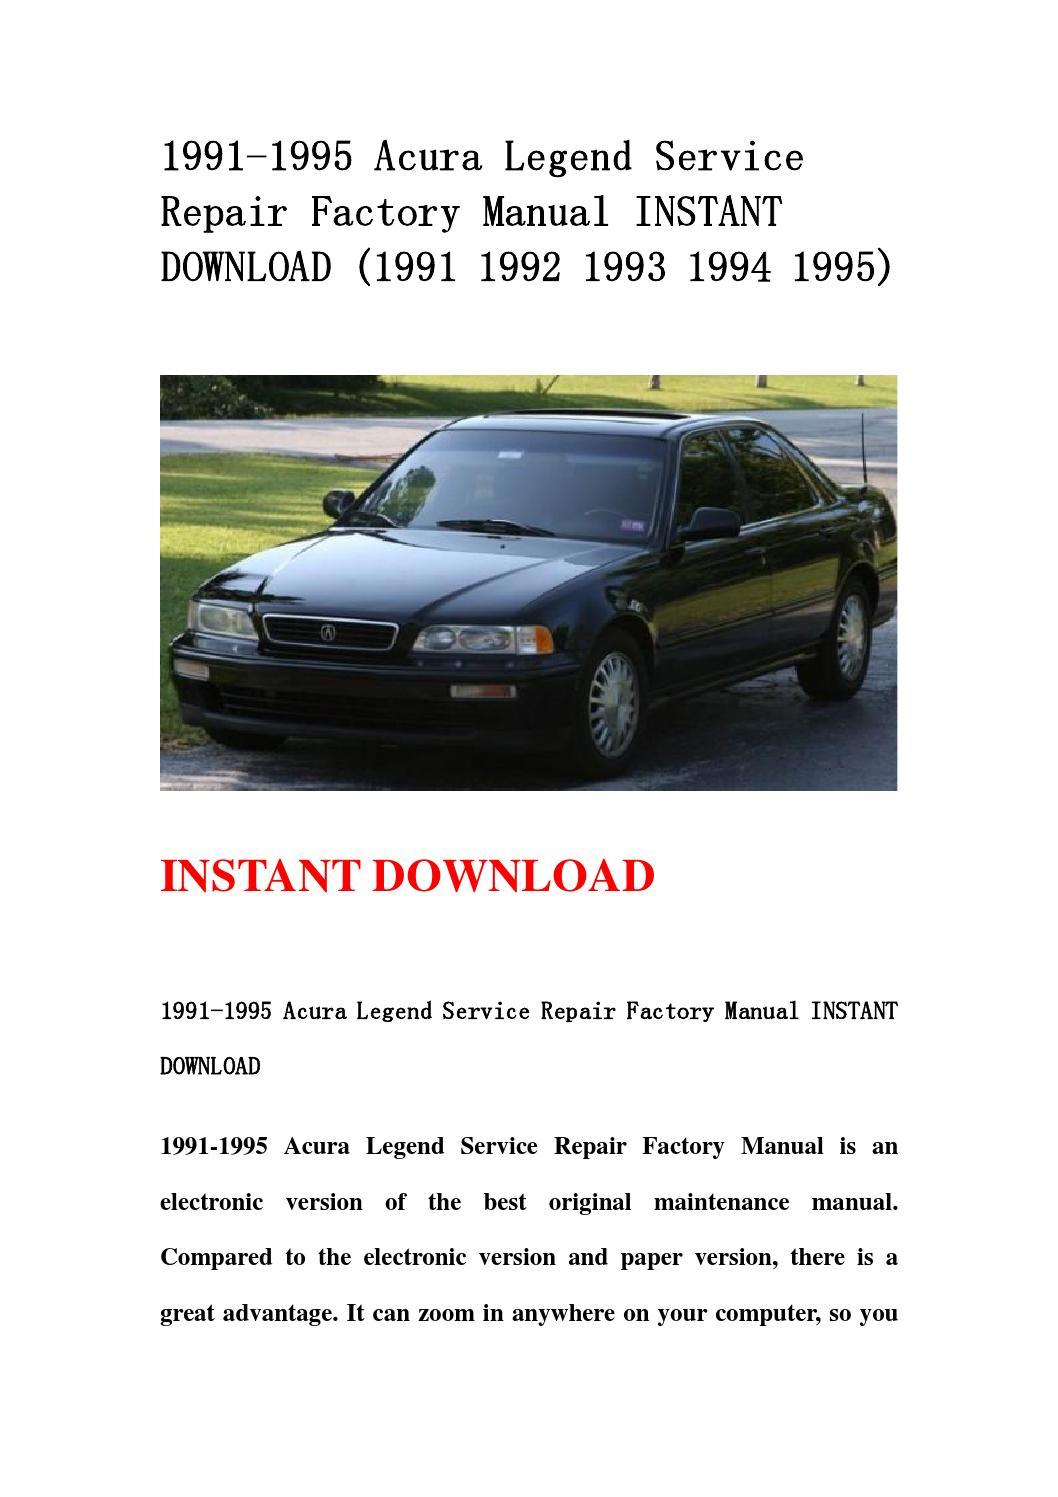 1991 1995 acura legend service repair factory manual instant download (1991  1992 1993 1994 1995) by kksjfnnse mkfjsemf - issuu